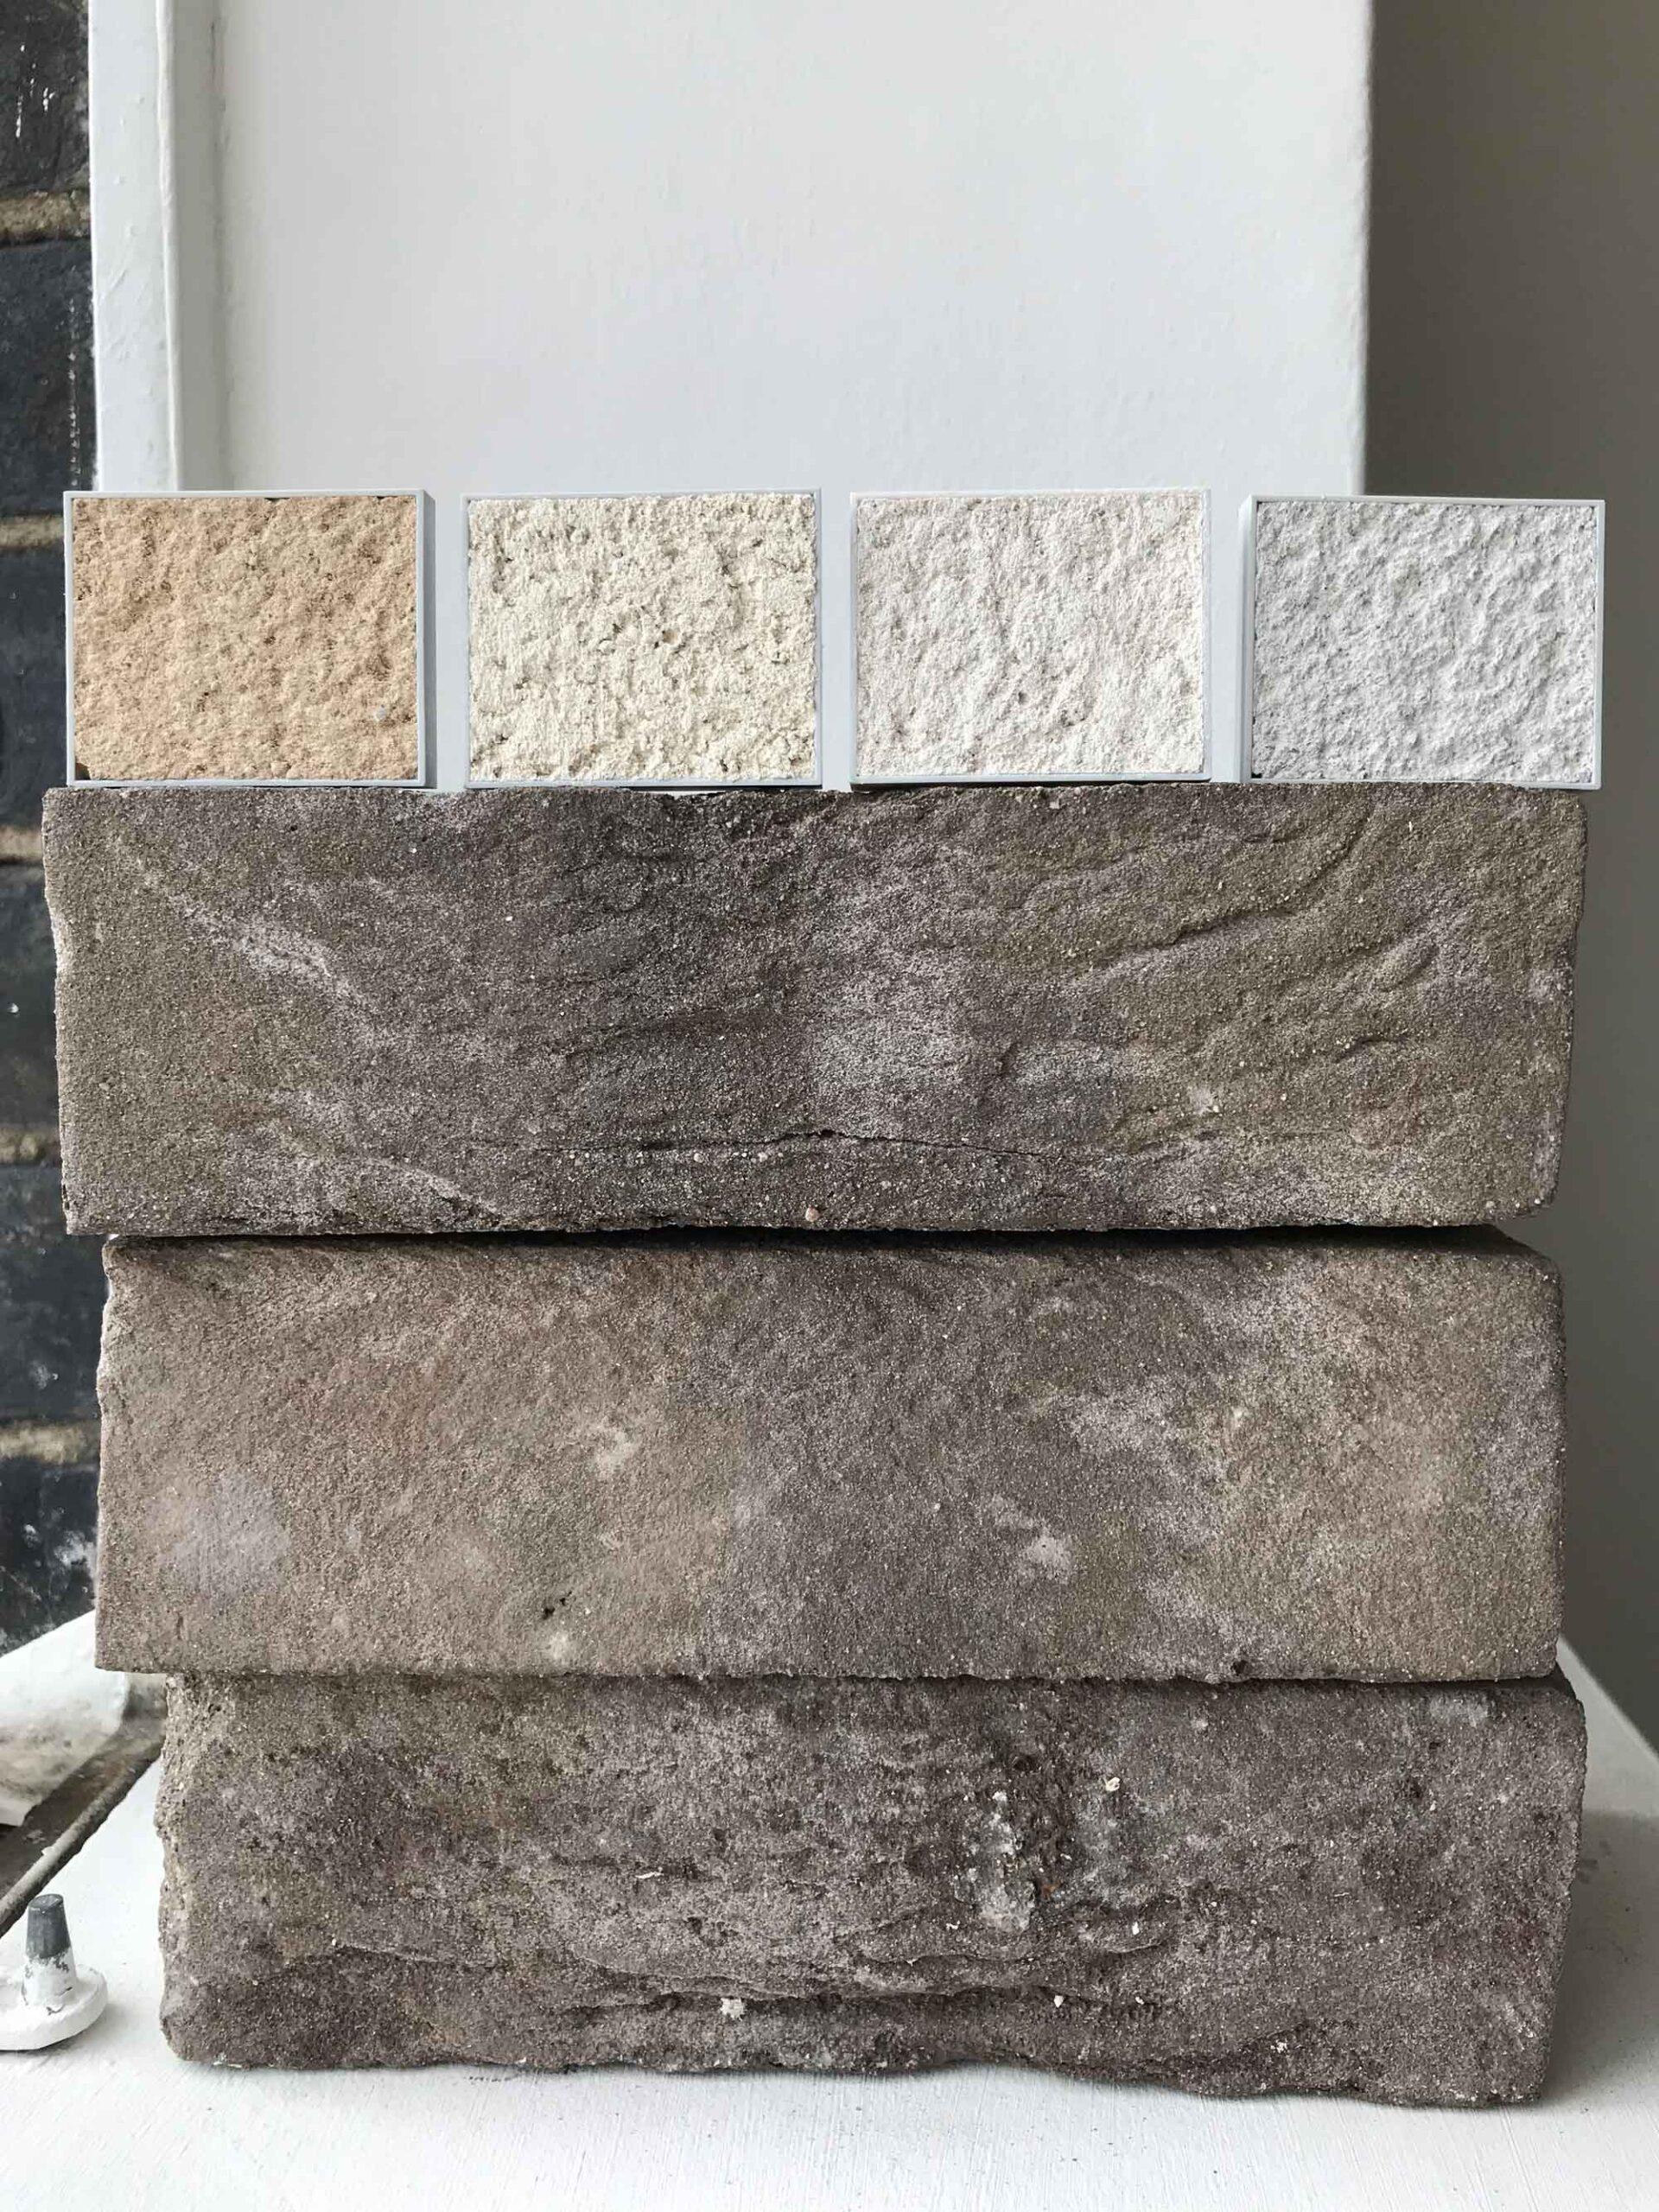 kensington-house-openstudio-architects-brick-samples